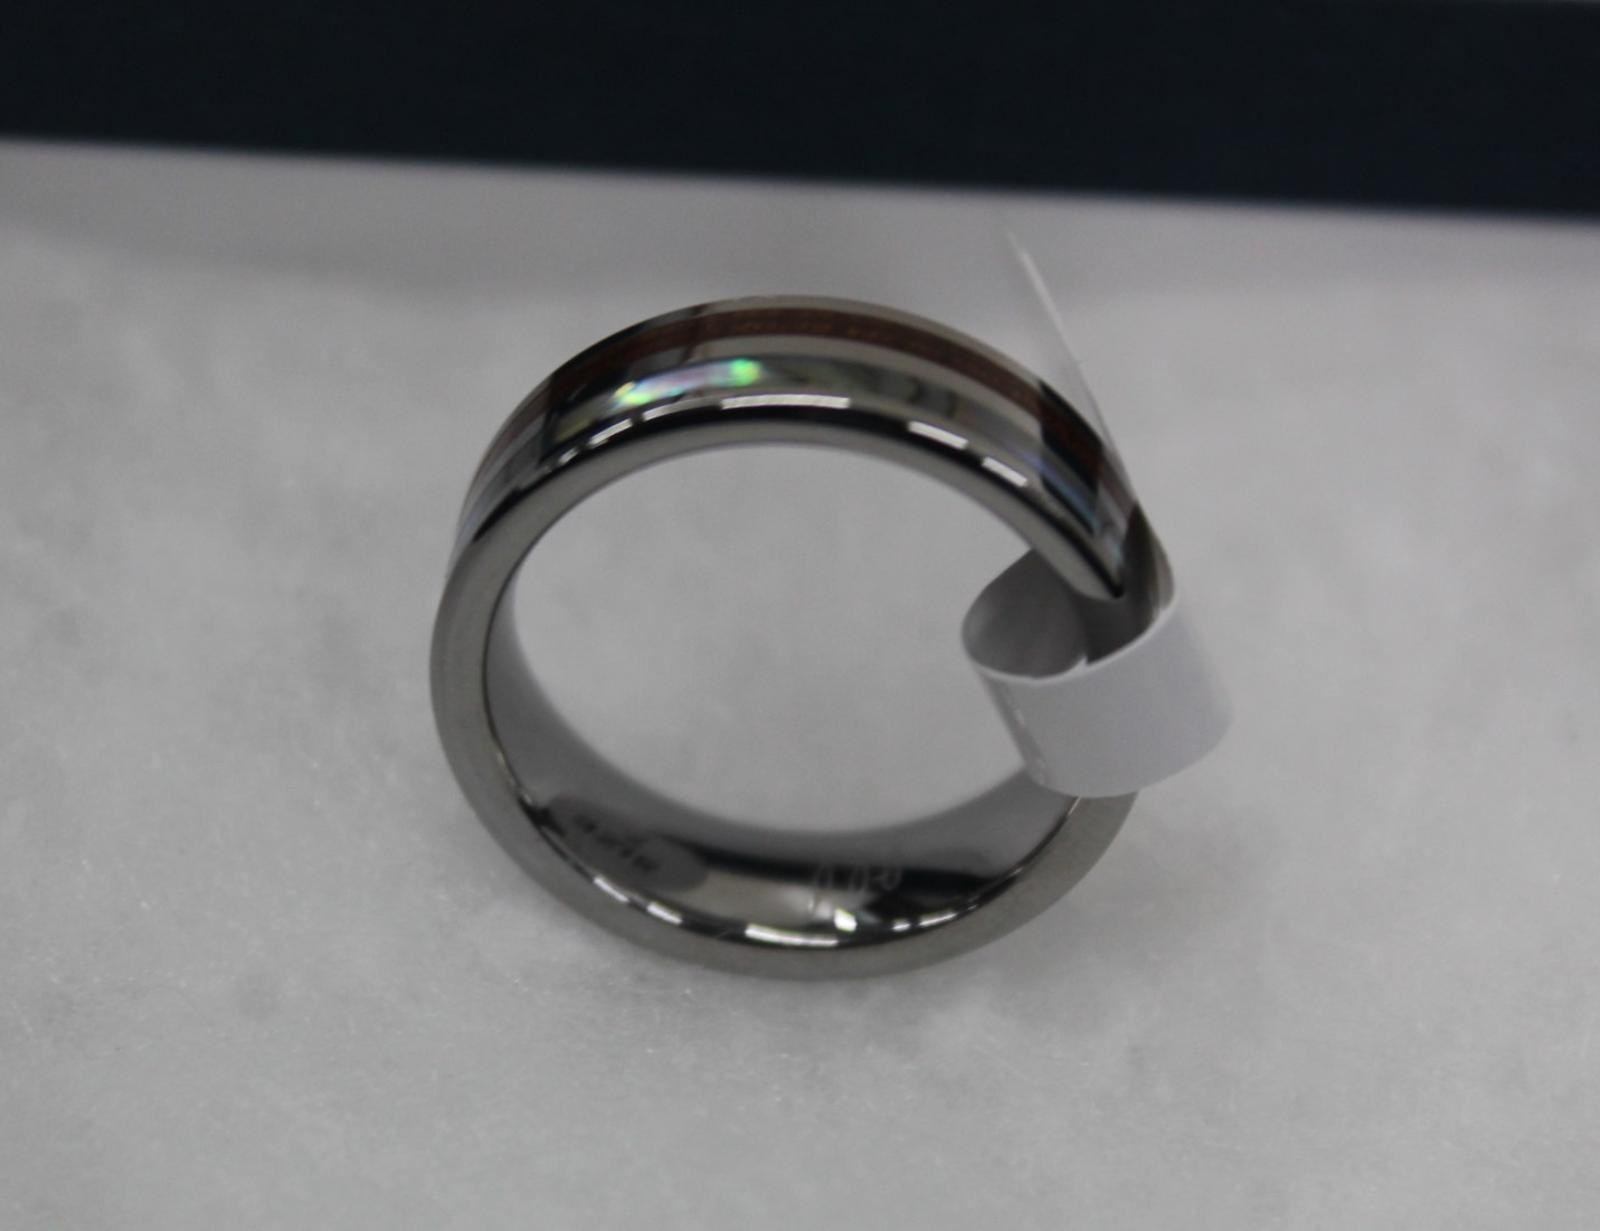 BNIB-Hawaiian-Koa-Wood-Abalone-Tungsten-8mm-Mens-Wedding-Ring-Band-Size-N-7